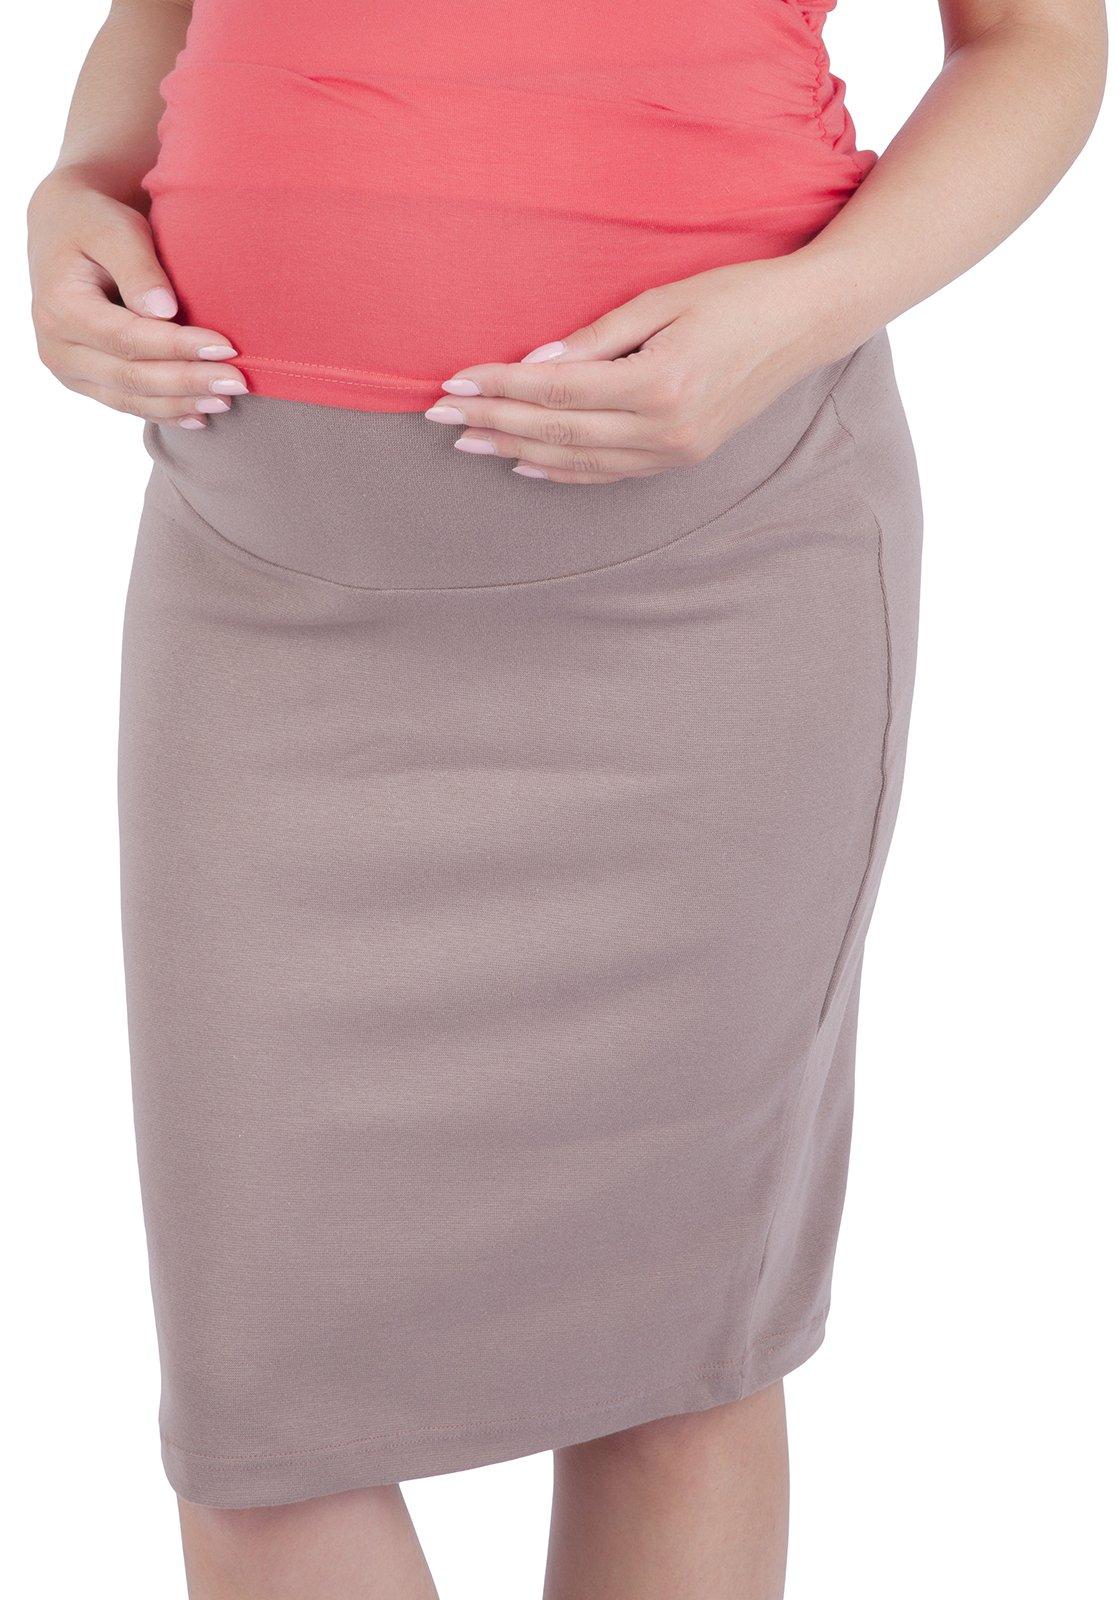 Mija - Maternity pregnnacy jersey skirt with soft panel 3045 (US 10/12, Cappuccino)